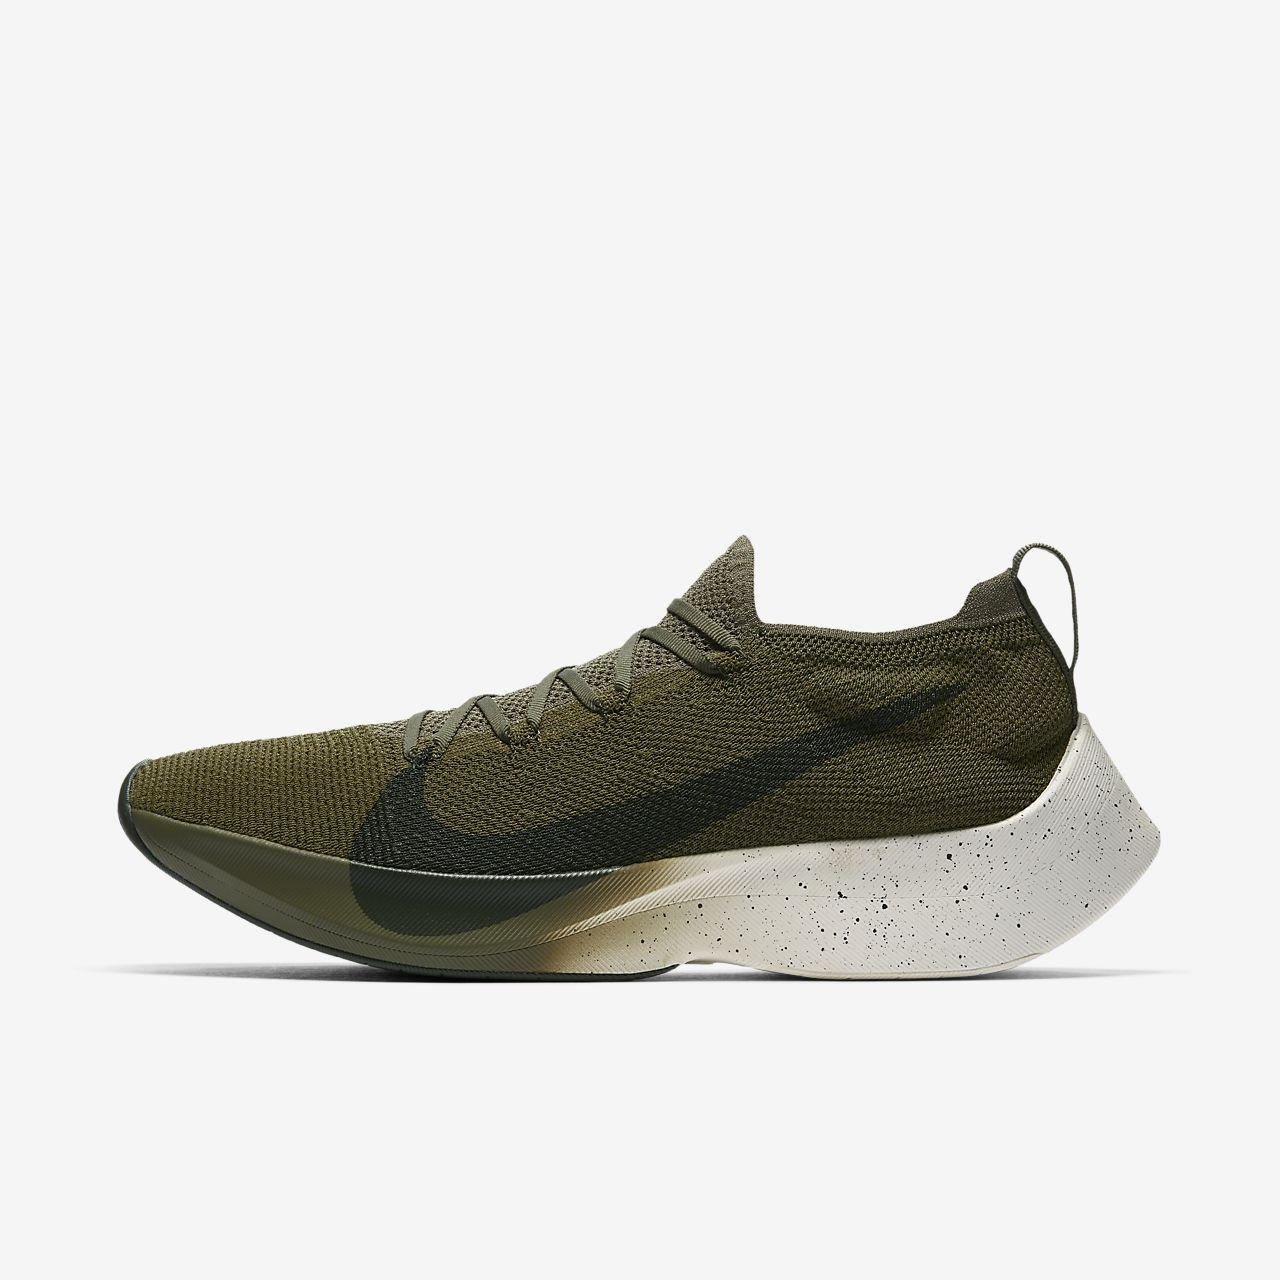 8dcd7deb88 Nike React Vapor Street Flyknit Men's Shoe. Nike.com AT